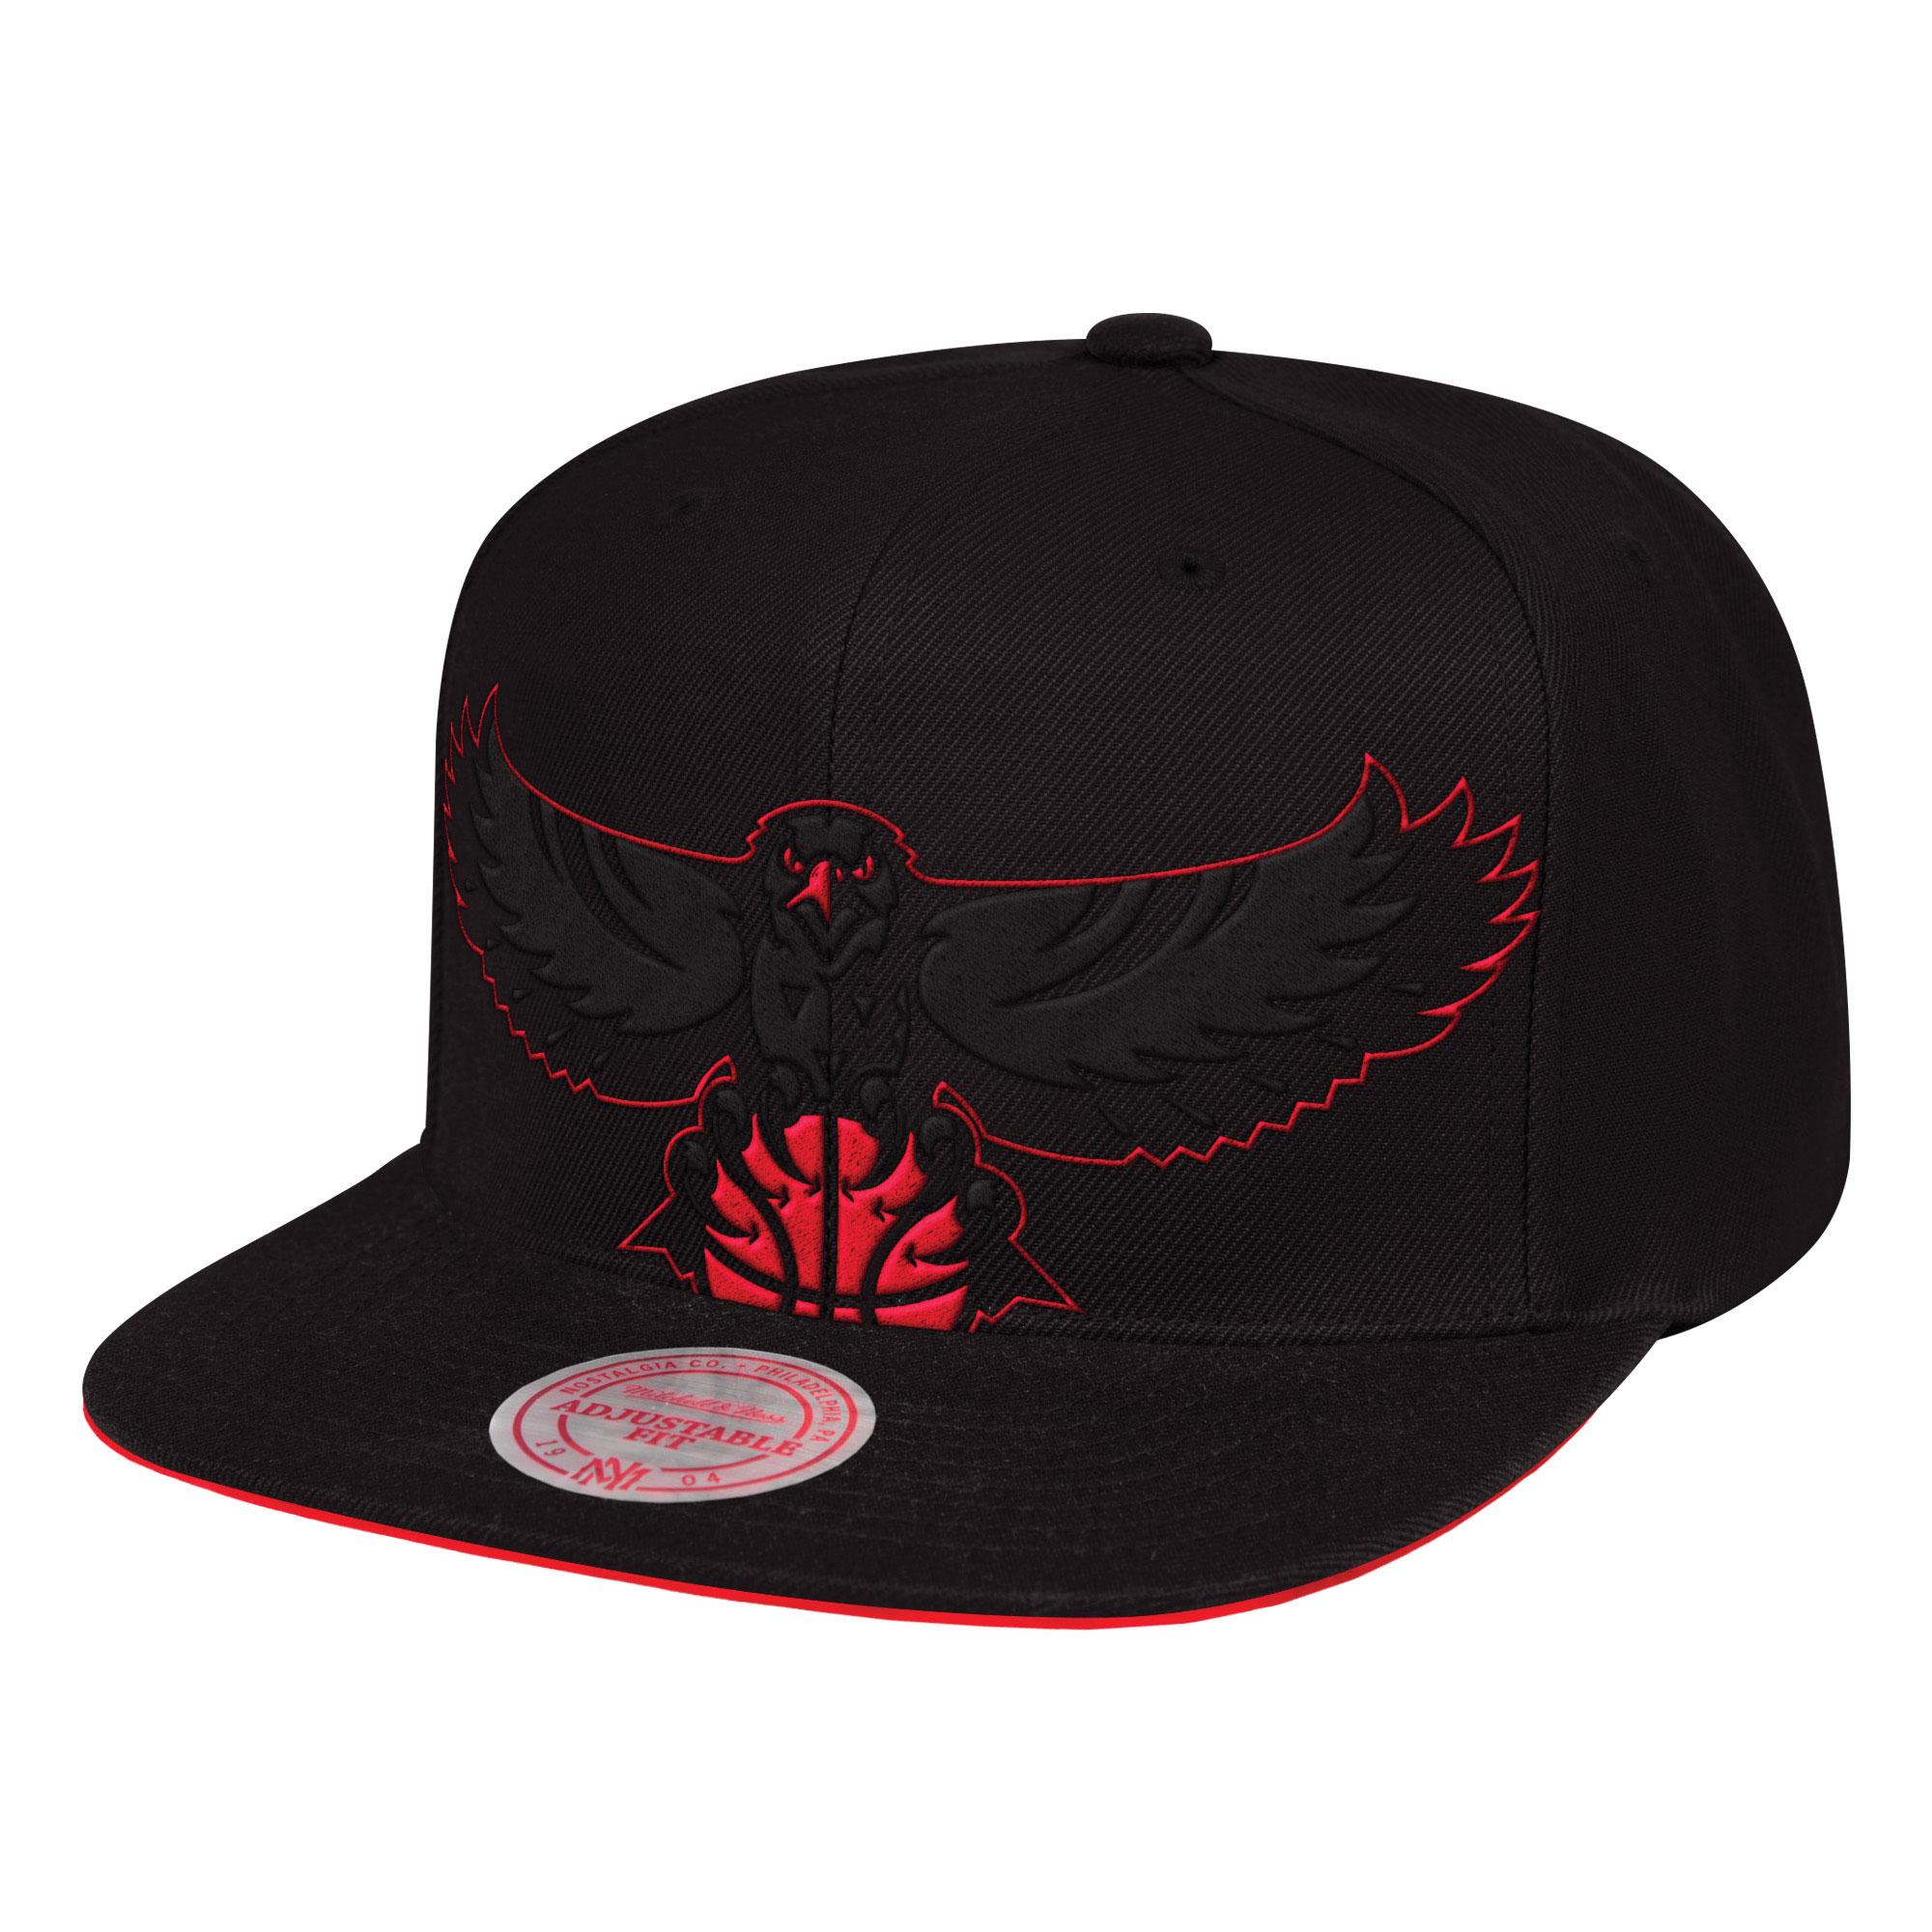 "Image of ""Atlanta Hawks Hardwood Classics Cropped XL Snapback Cap By Mitchell & Ness"""